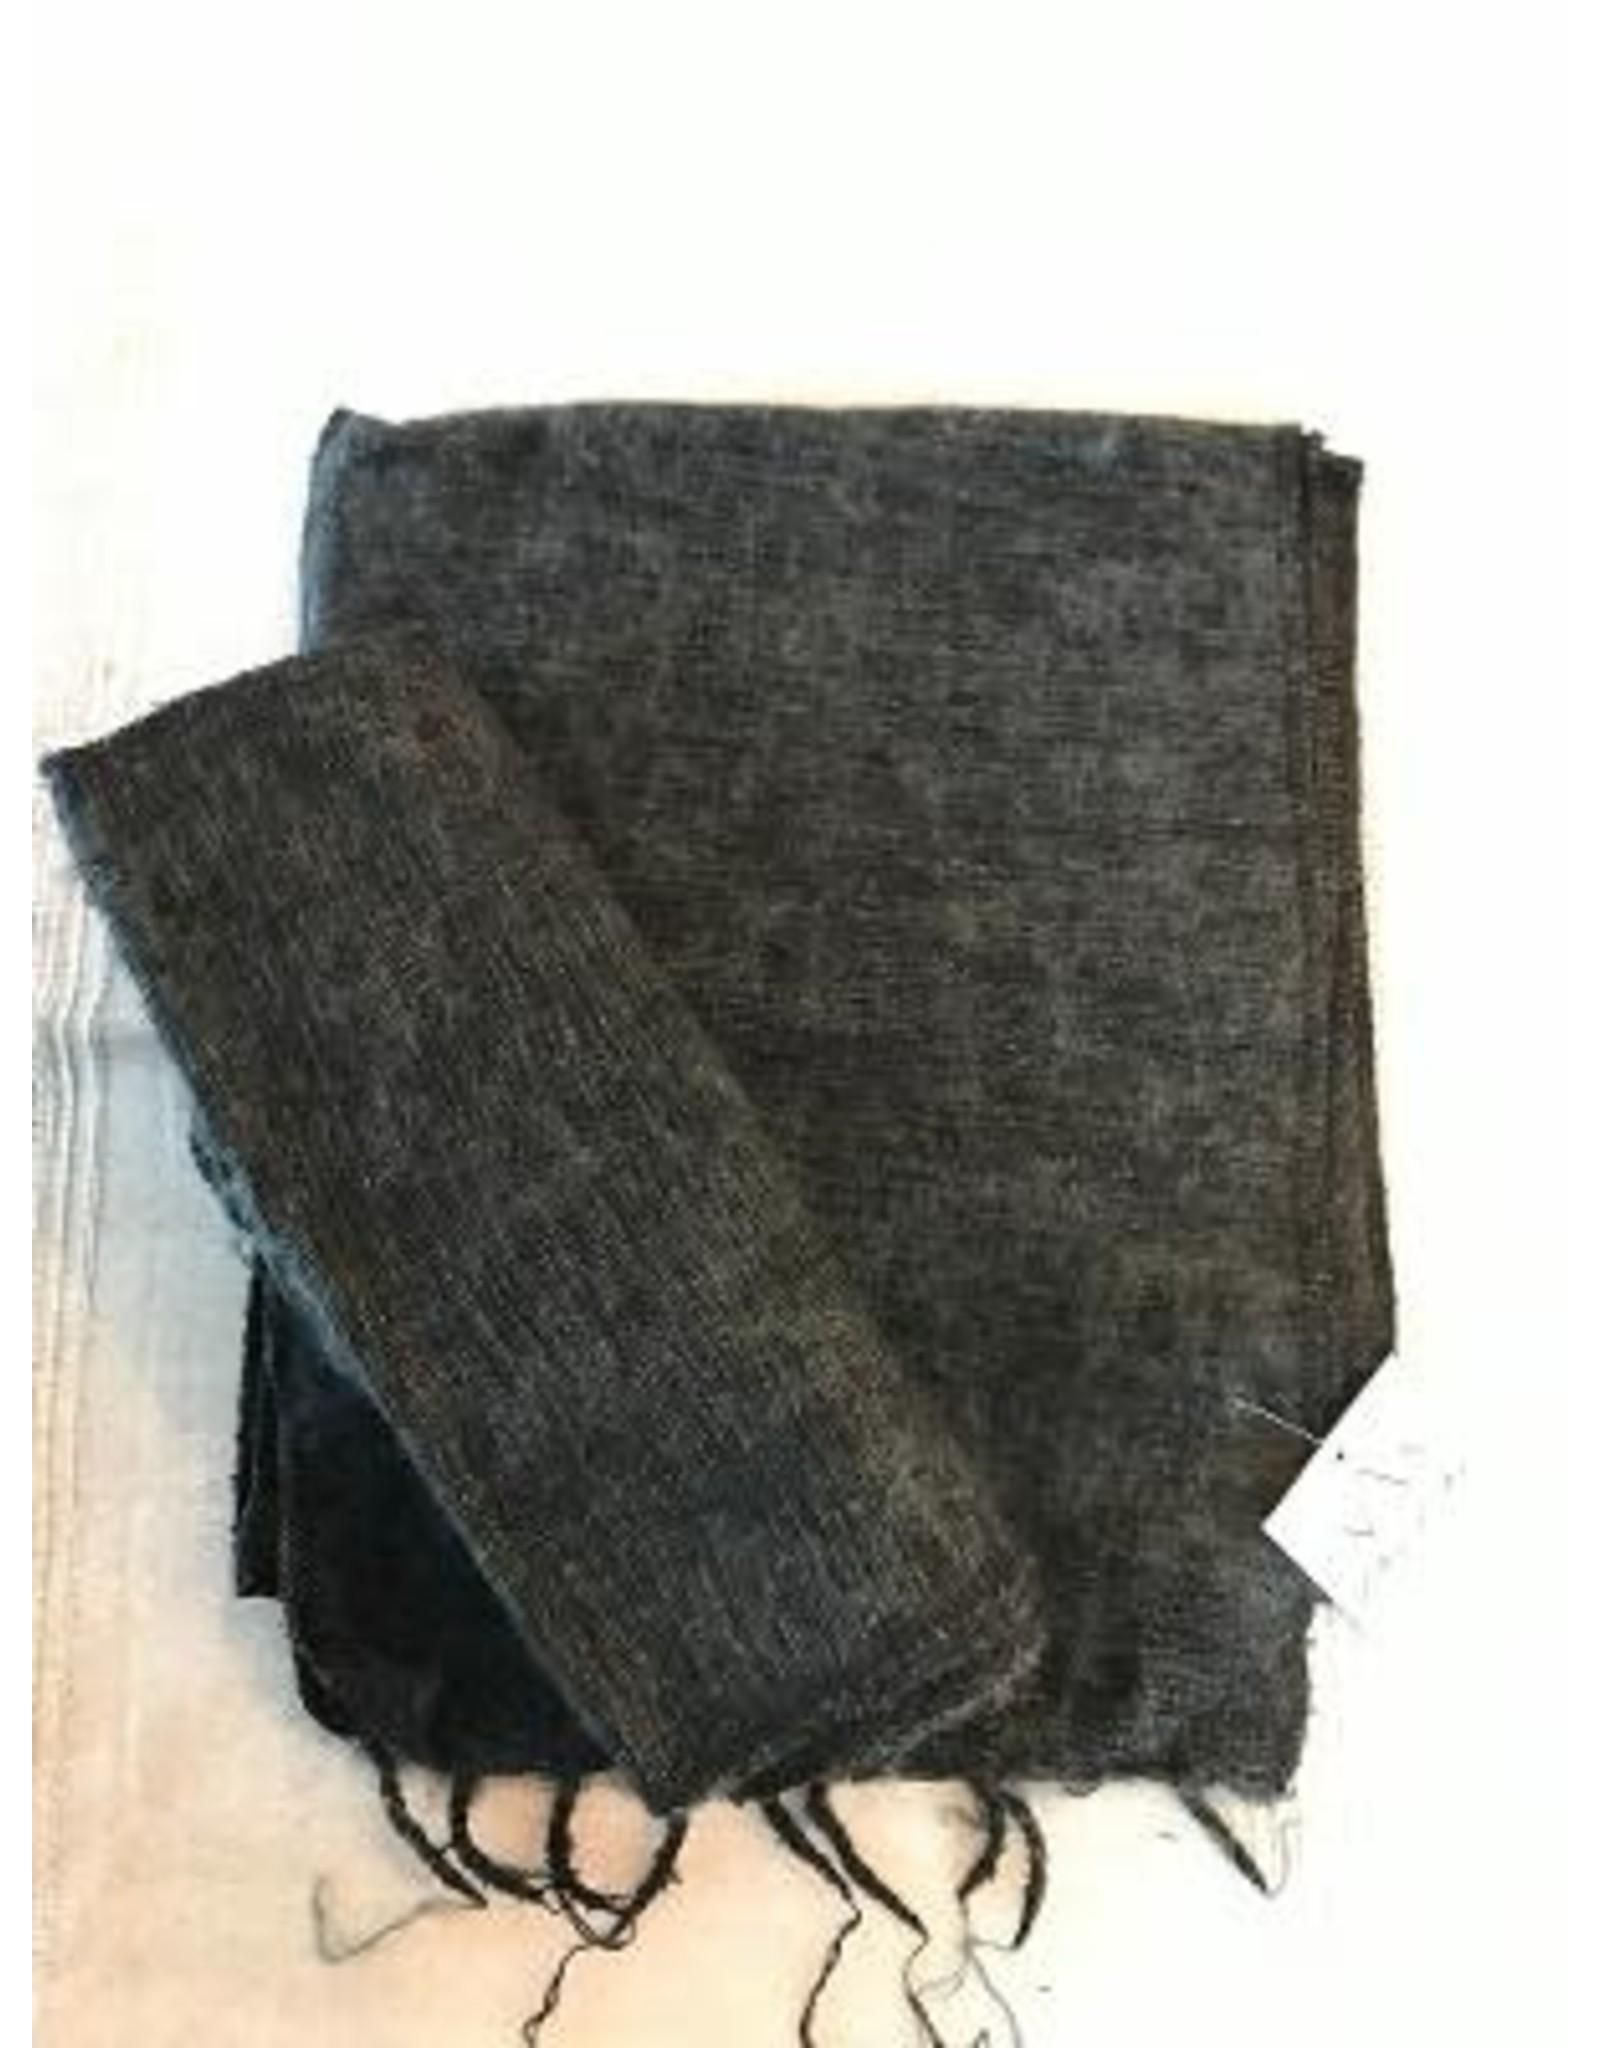 Brushed Woven Cotton, Acrylic Blanket, Charcoal